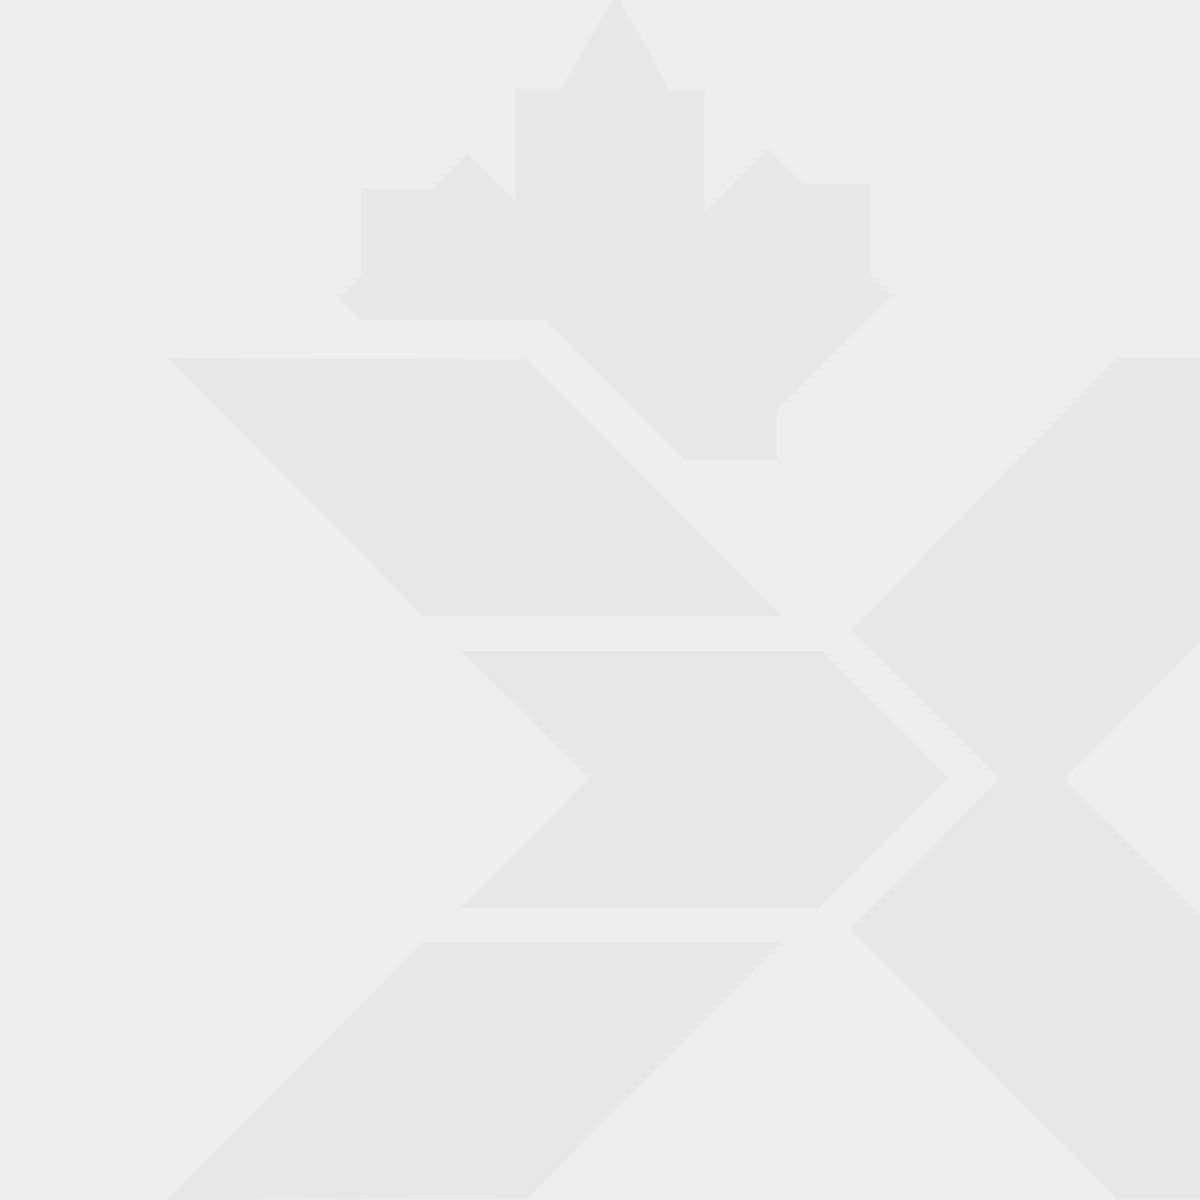 The Royal Canadian Legion Poppy Stud Earrings